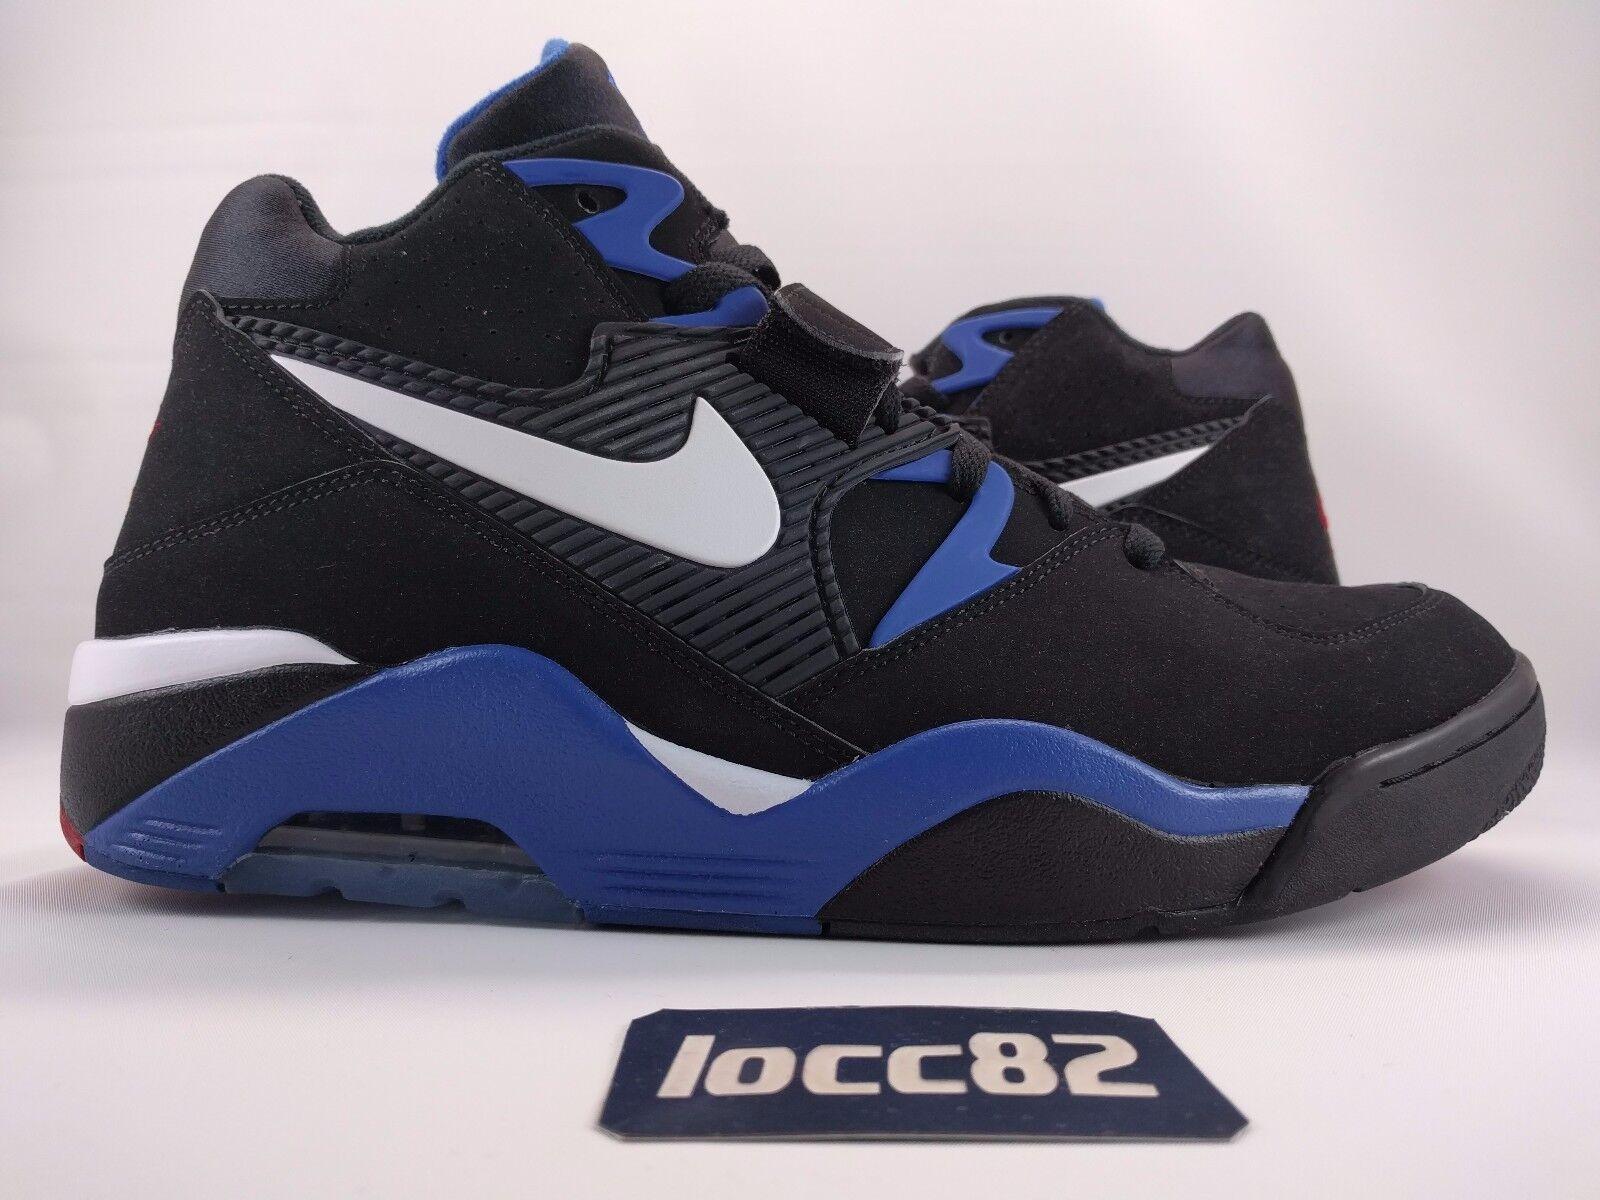 NIKE MEN'S AIR FORCE 180 RETRO CB BARKLEY BLACK BLUE WHITE (310095-011) SZ 10